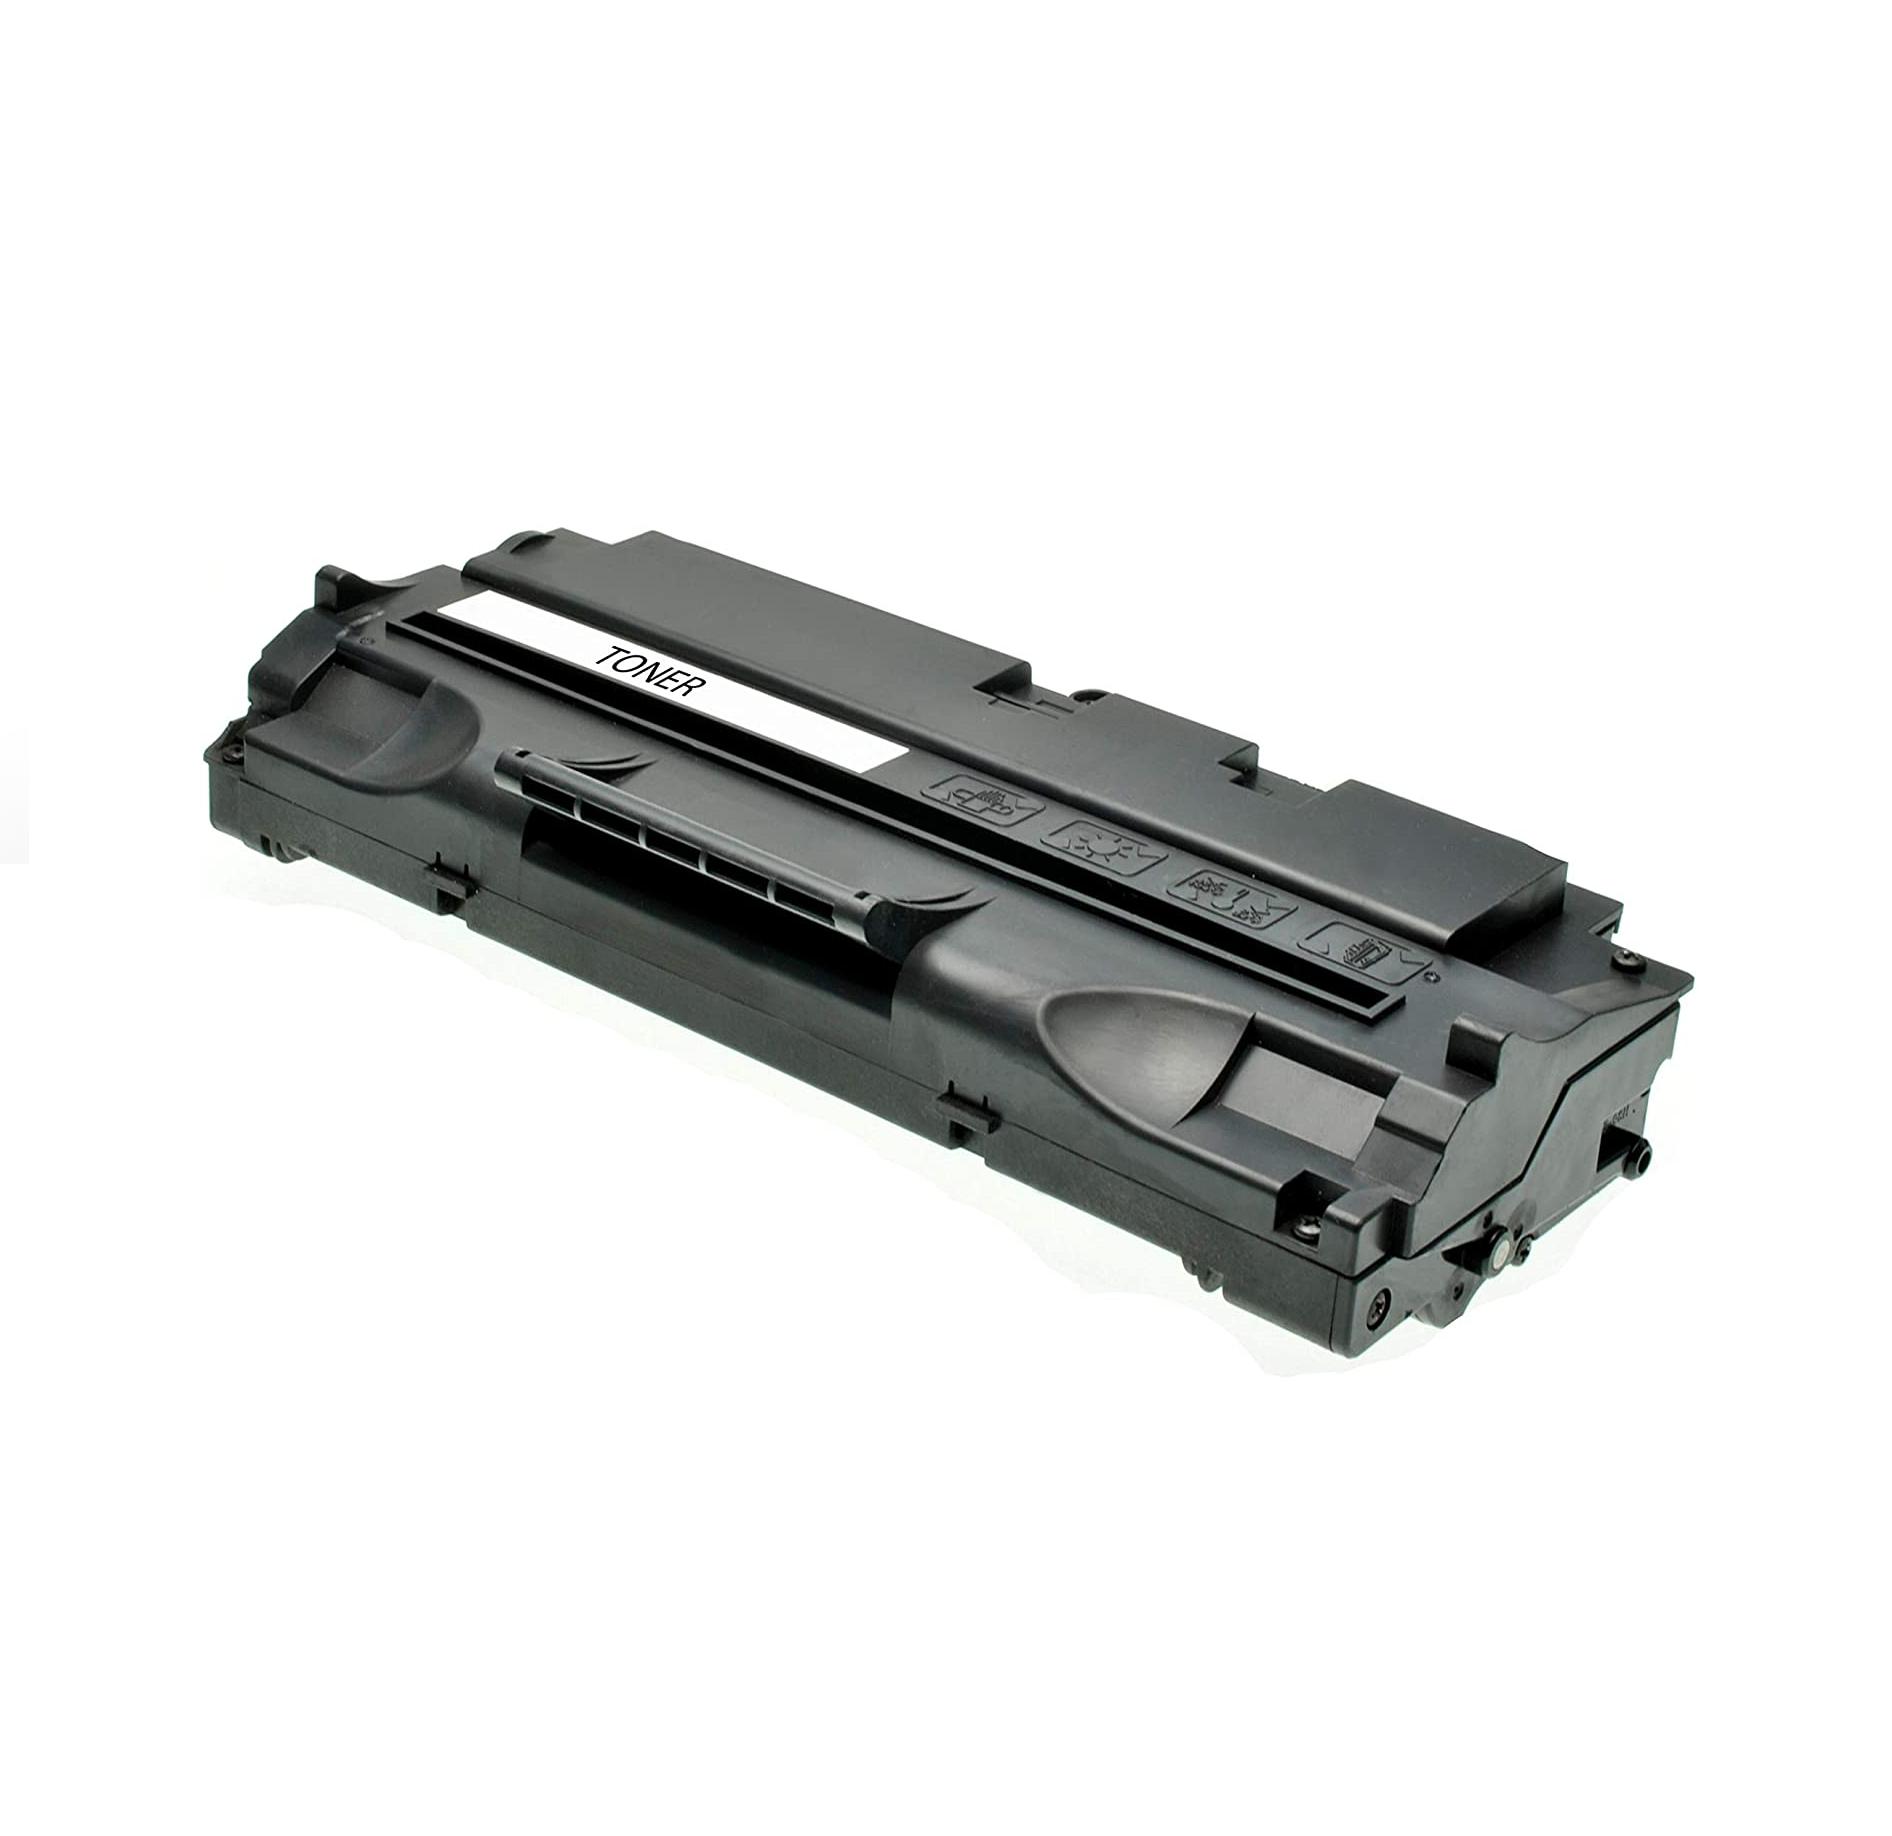 Lexmark E210 Black Generic Toner